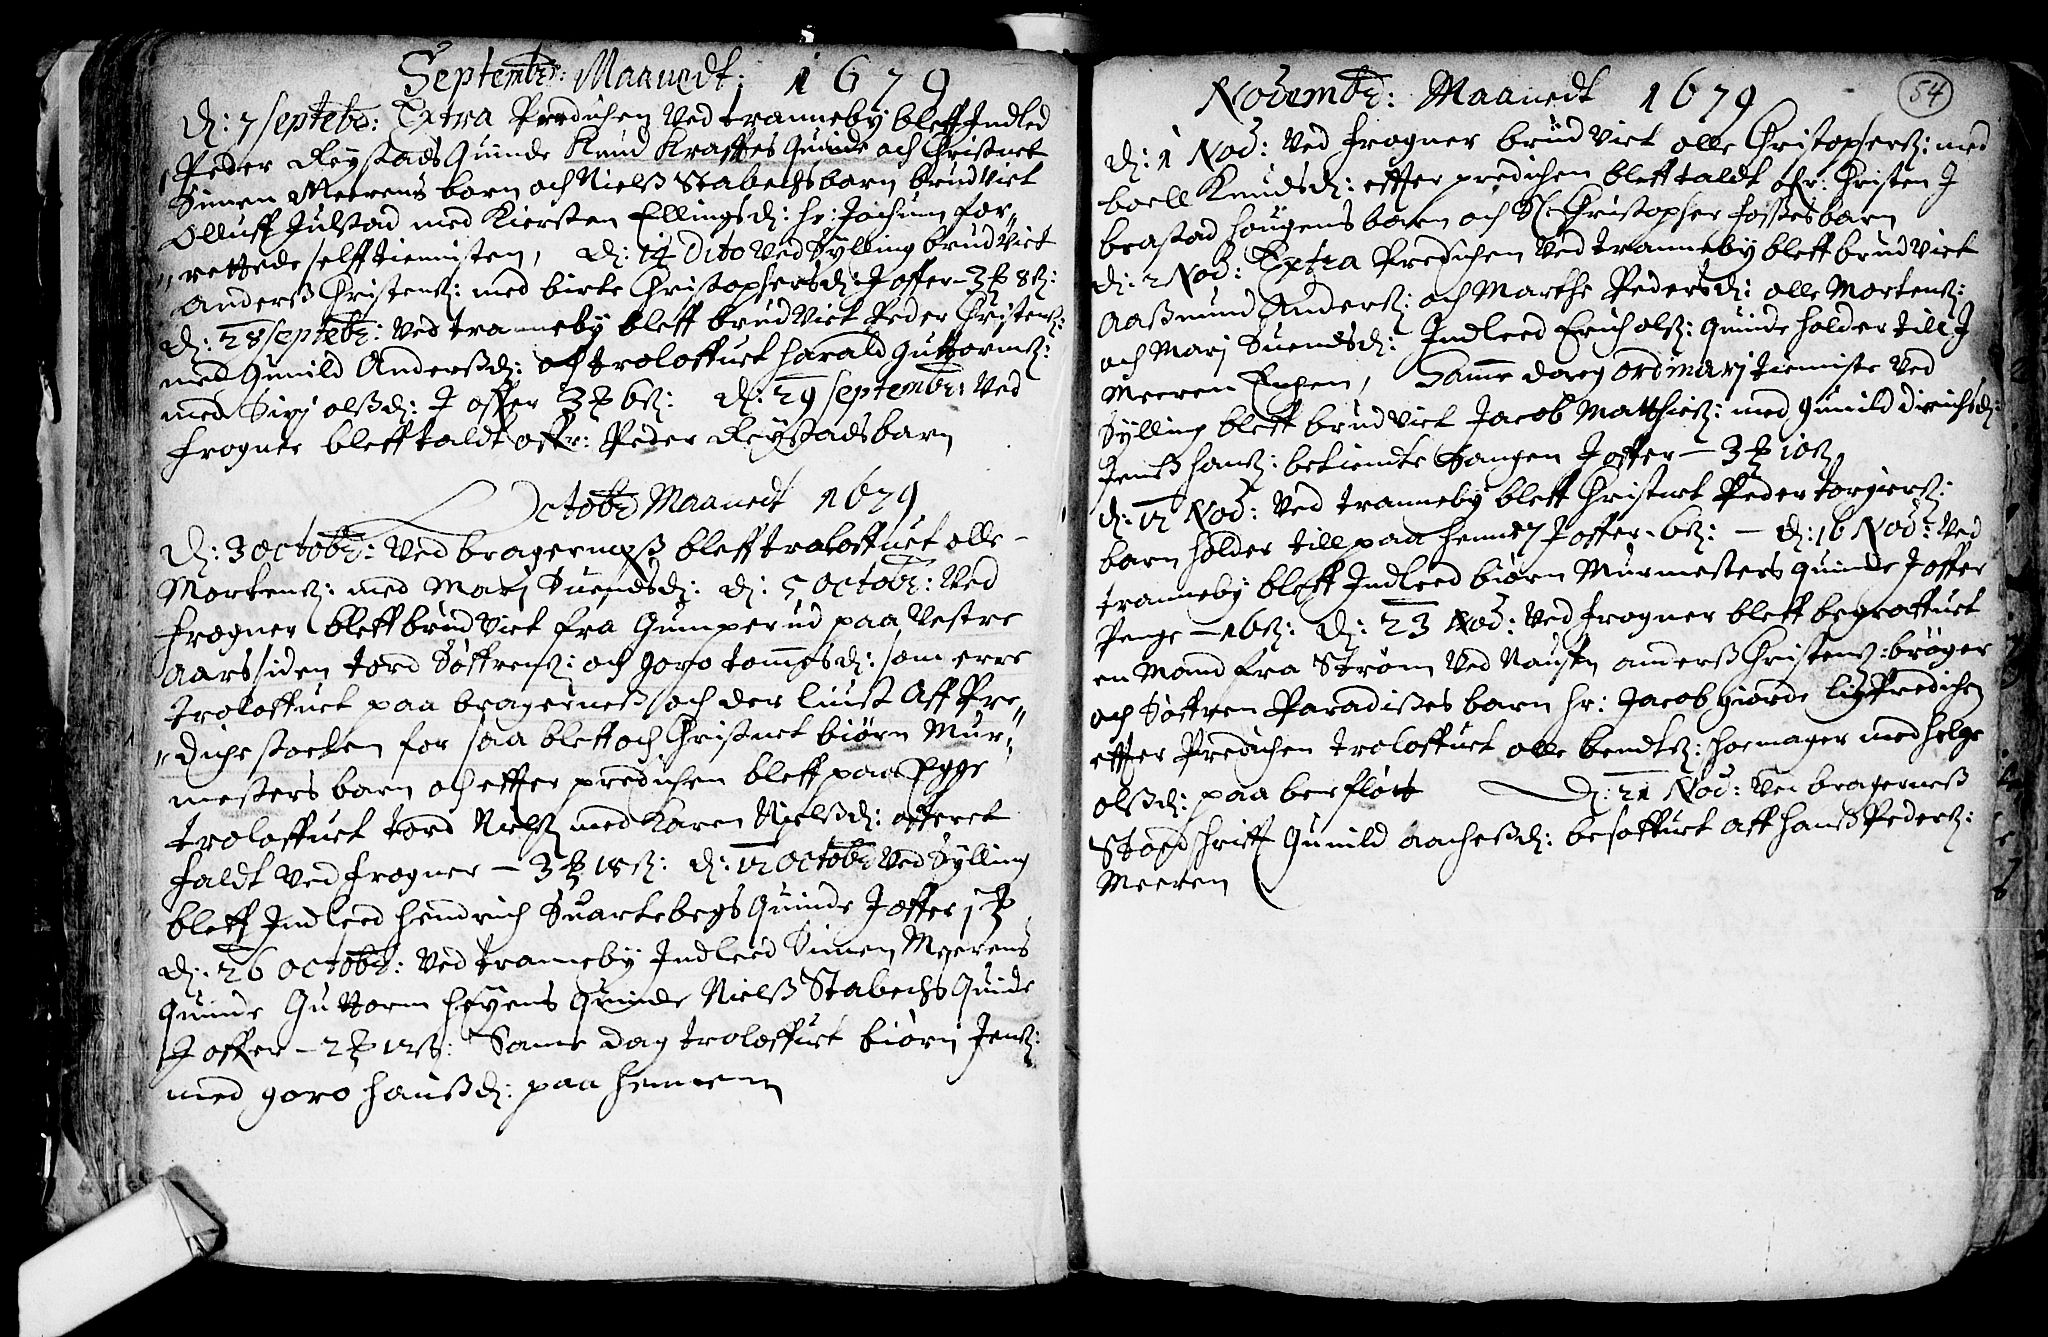 SAKO, Lier kirkebøker, F/Fa/L0001: Ministerialbok nr. I 1, 1672-1701, s. 54